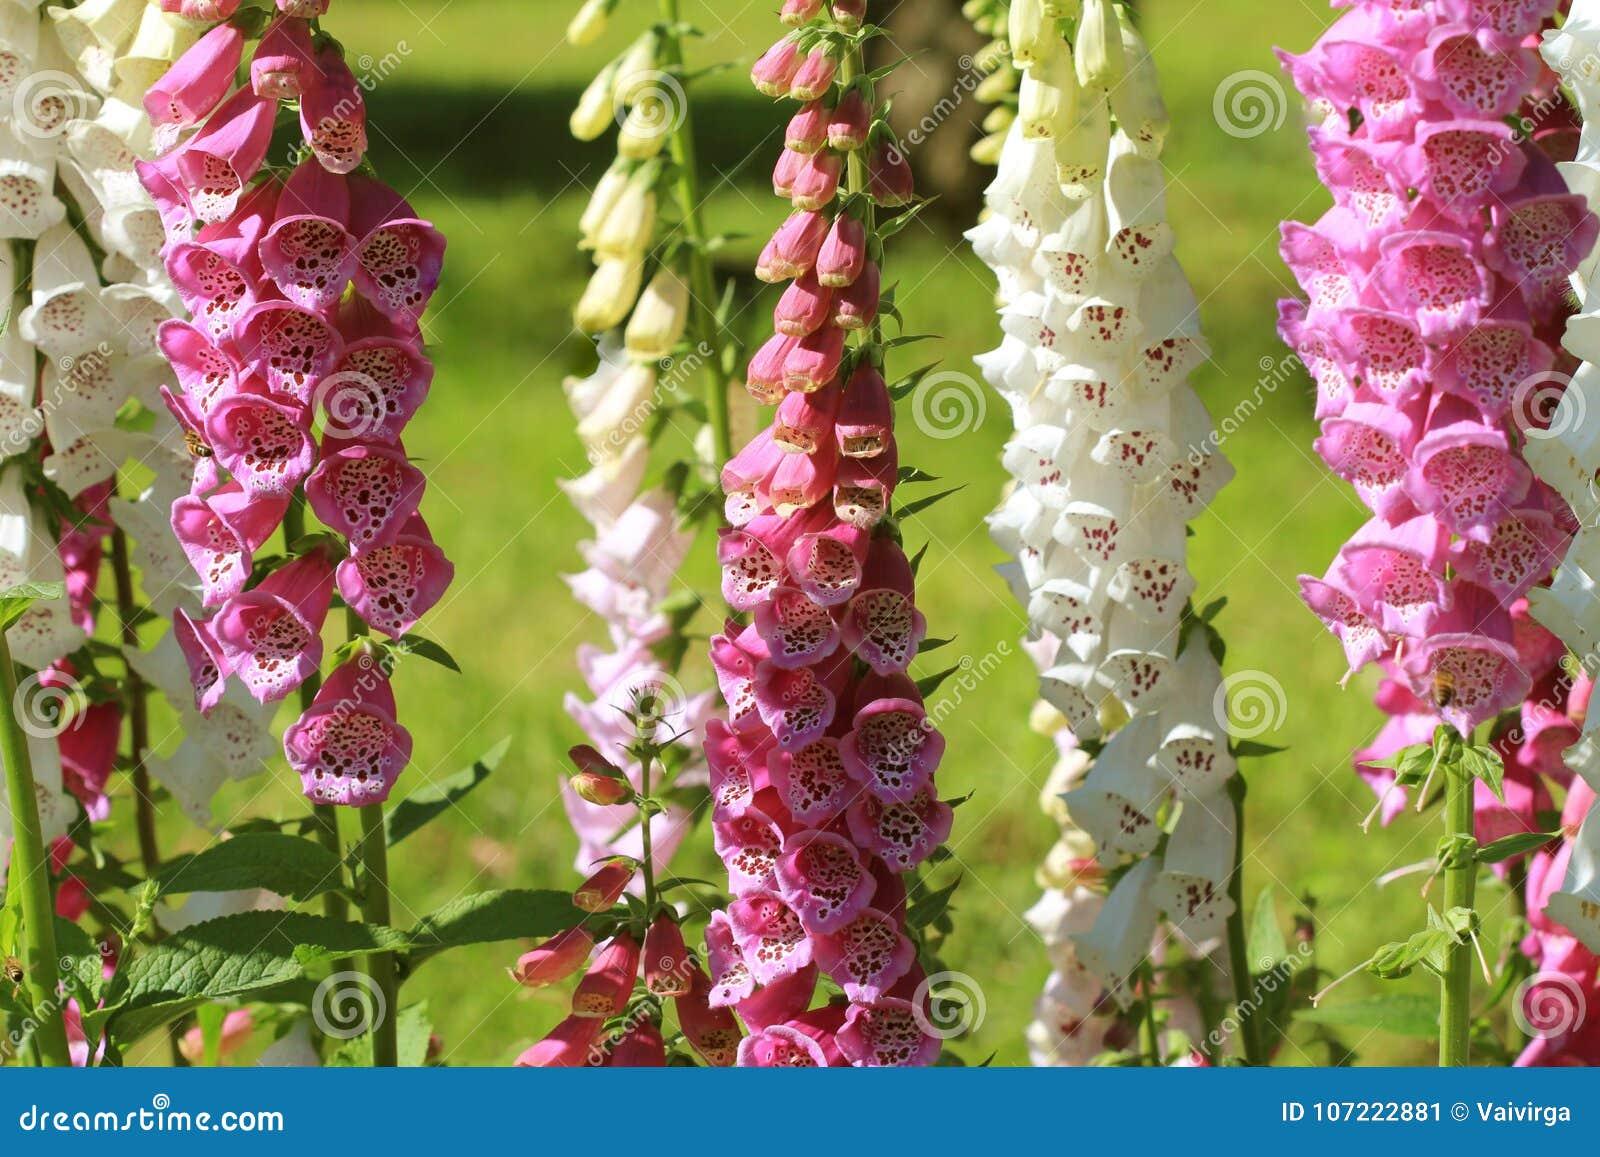 Pink Foxglove Flowers Or Digitalis In A Garden In Summer Stock Image